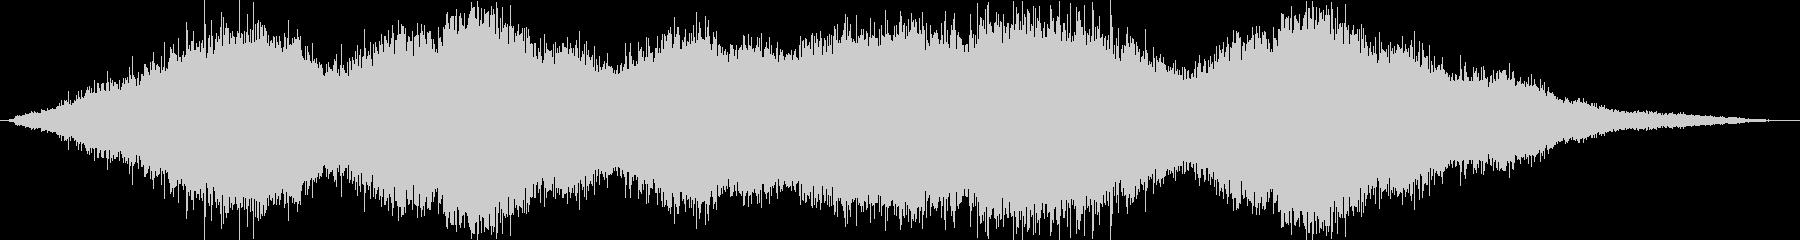 PADS 重い波01の未再生の波形